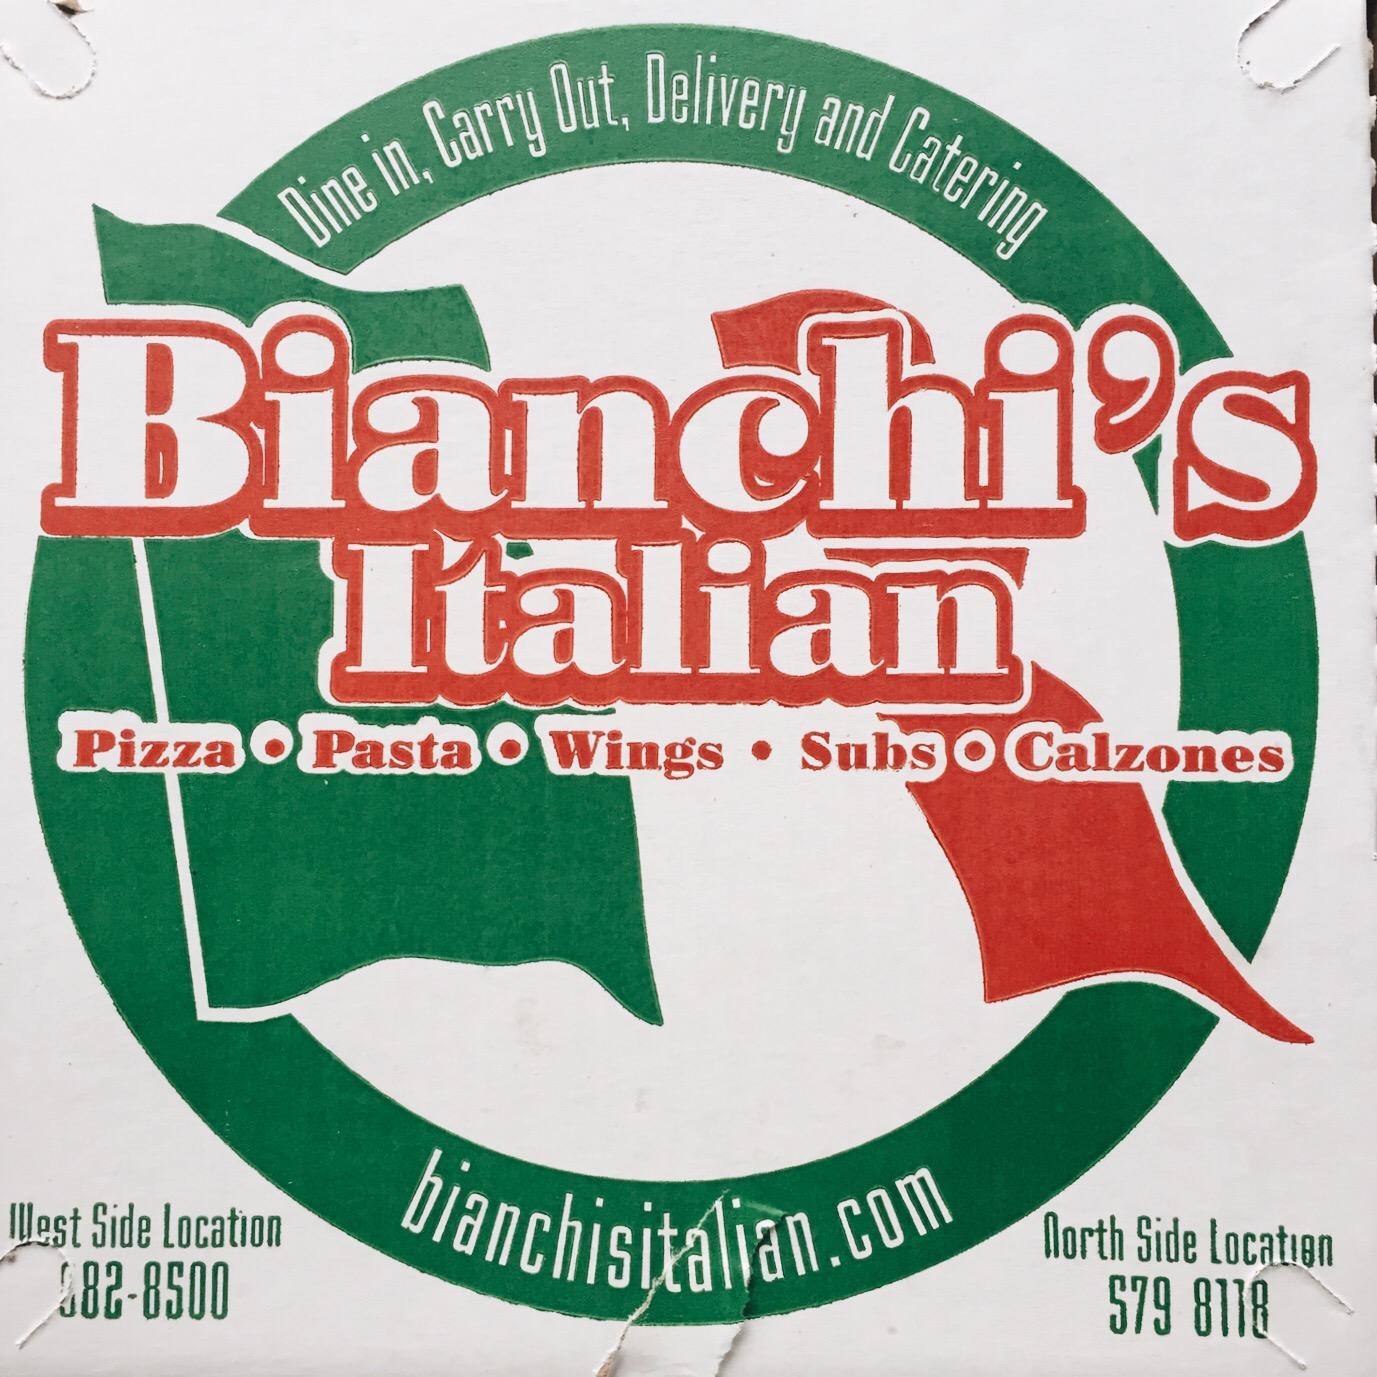 Bianchi's Italian Pizza Box